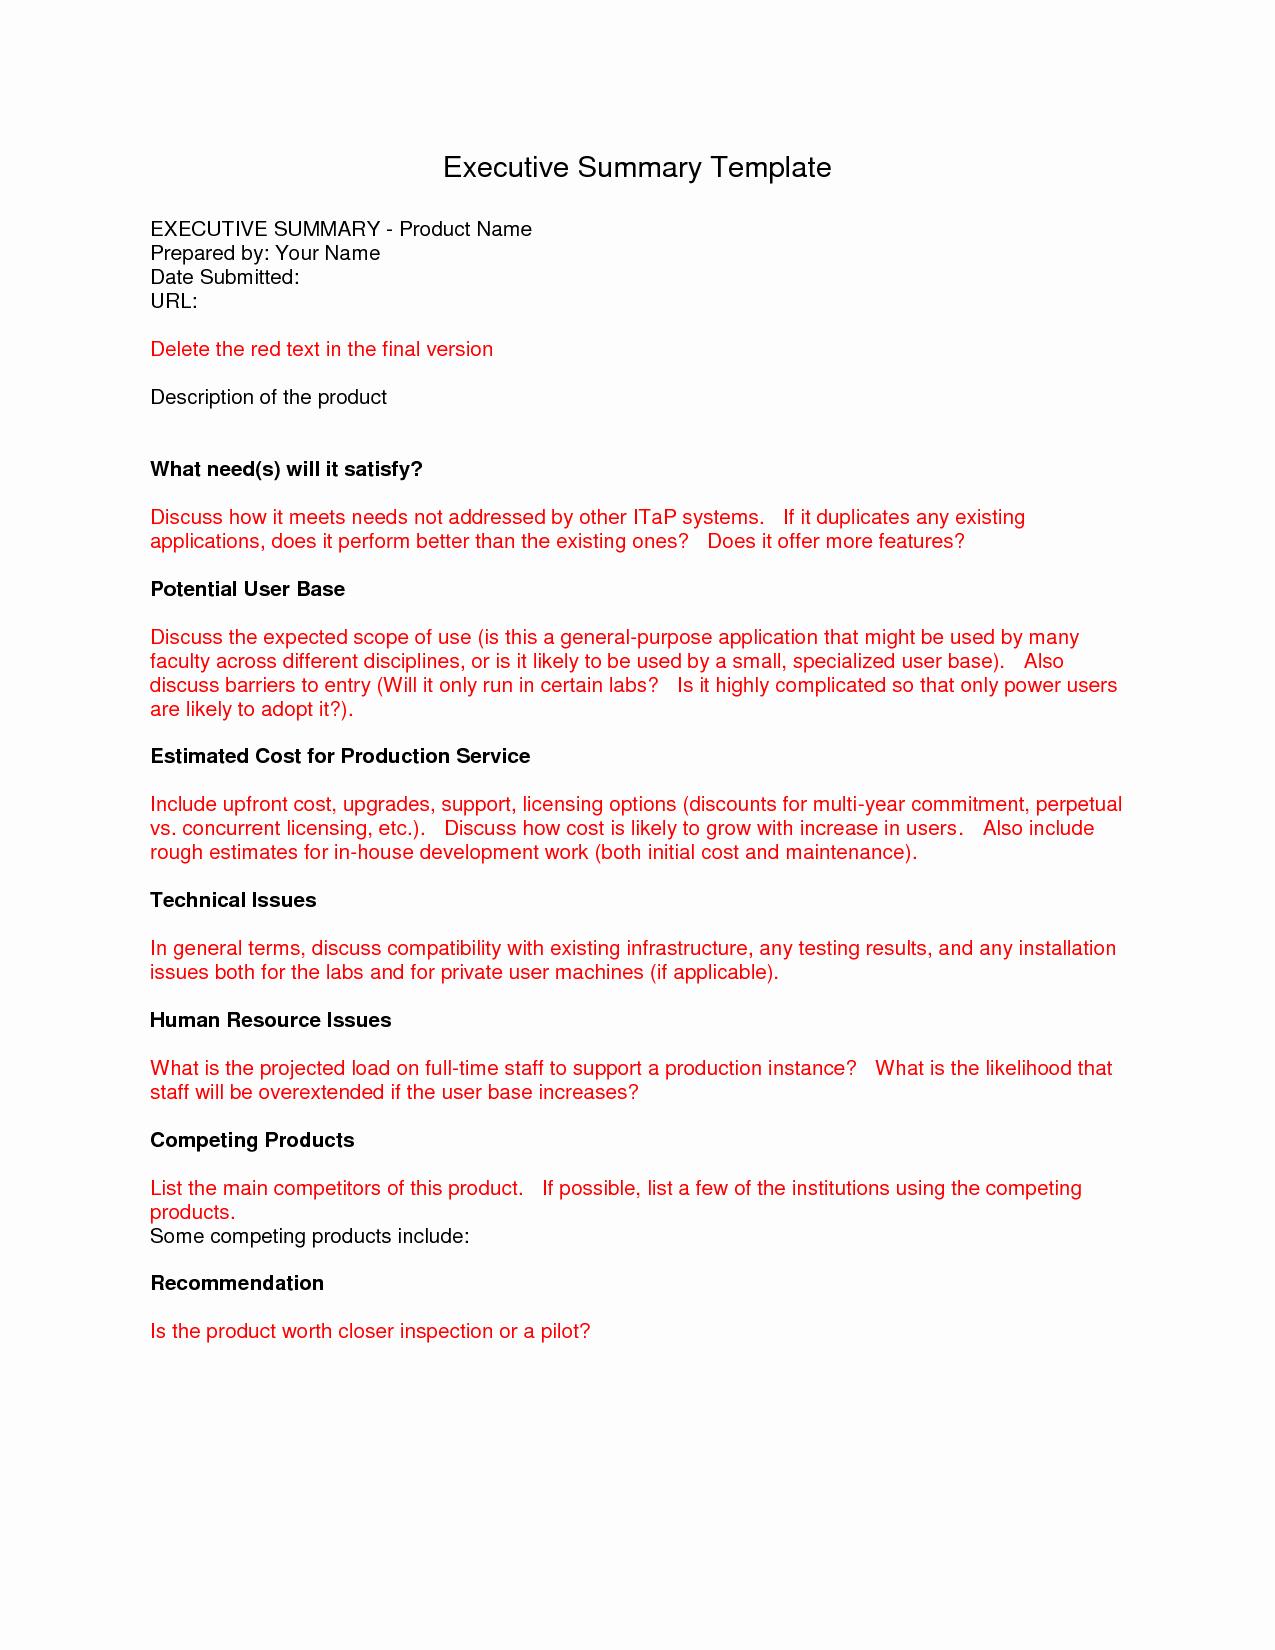 Summary Report format Elegant Executive Summary Template